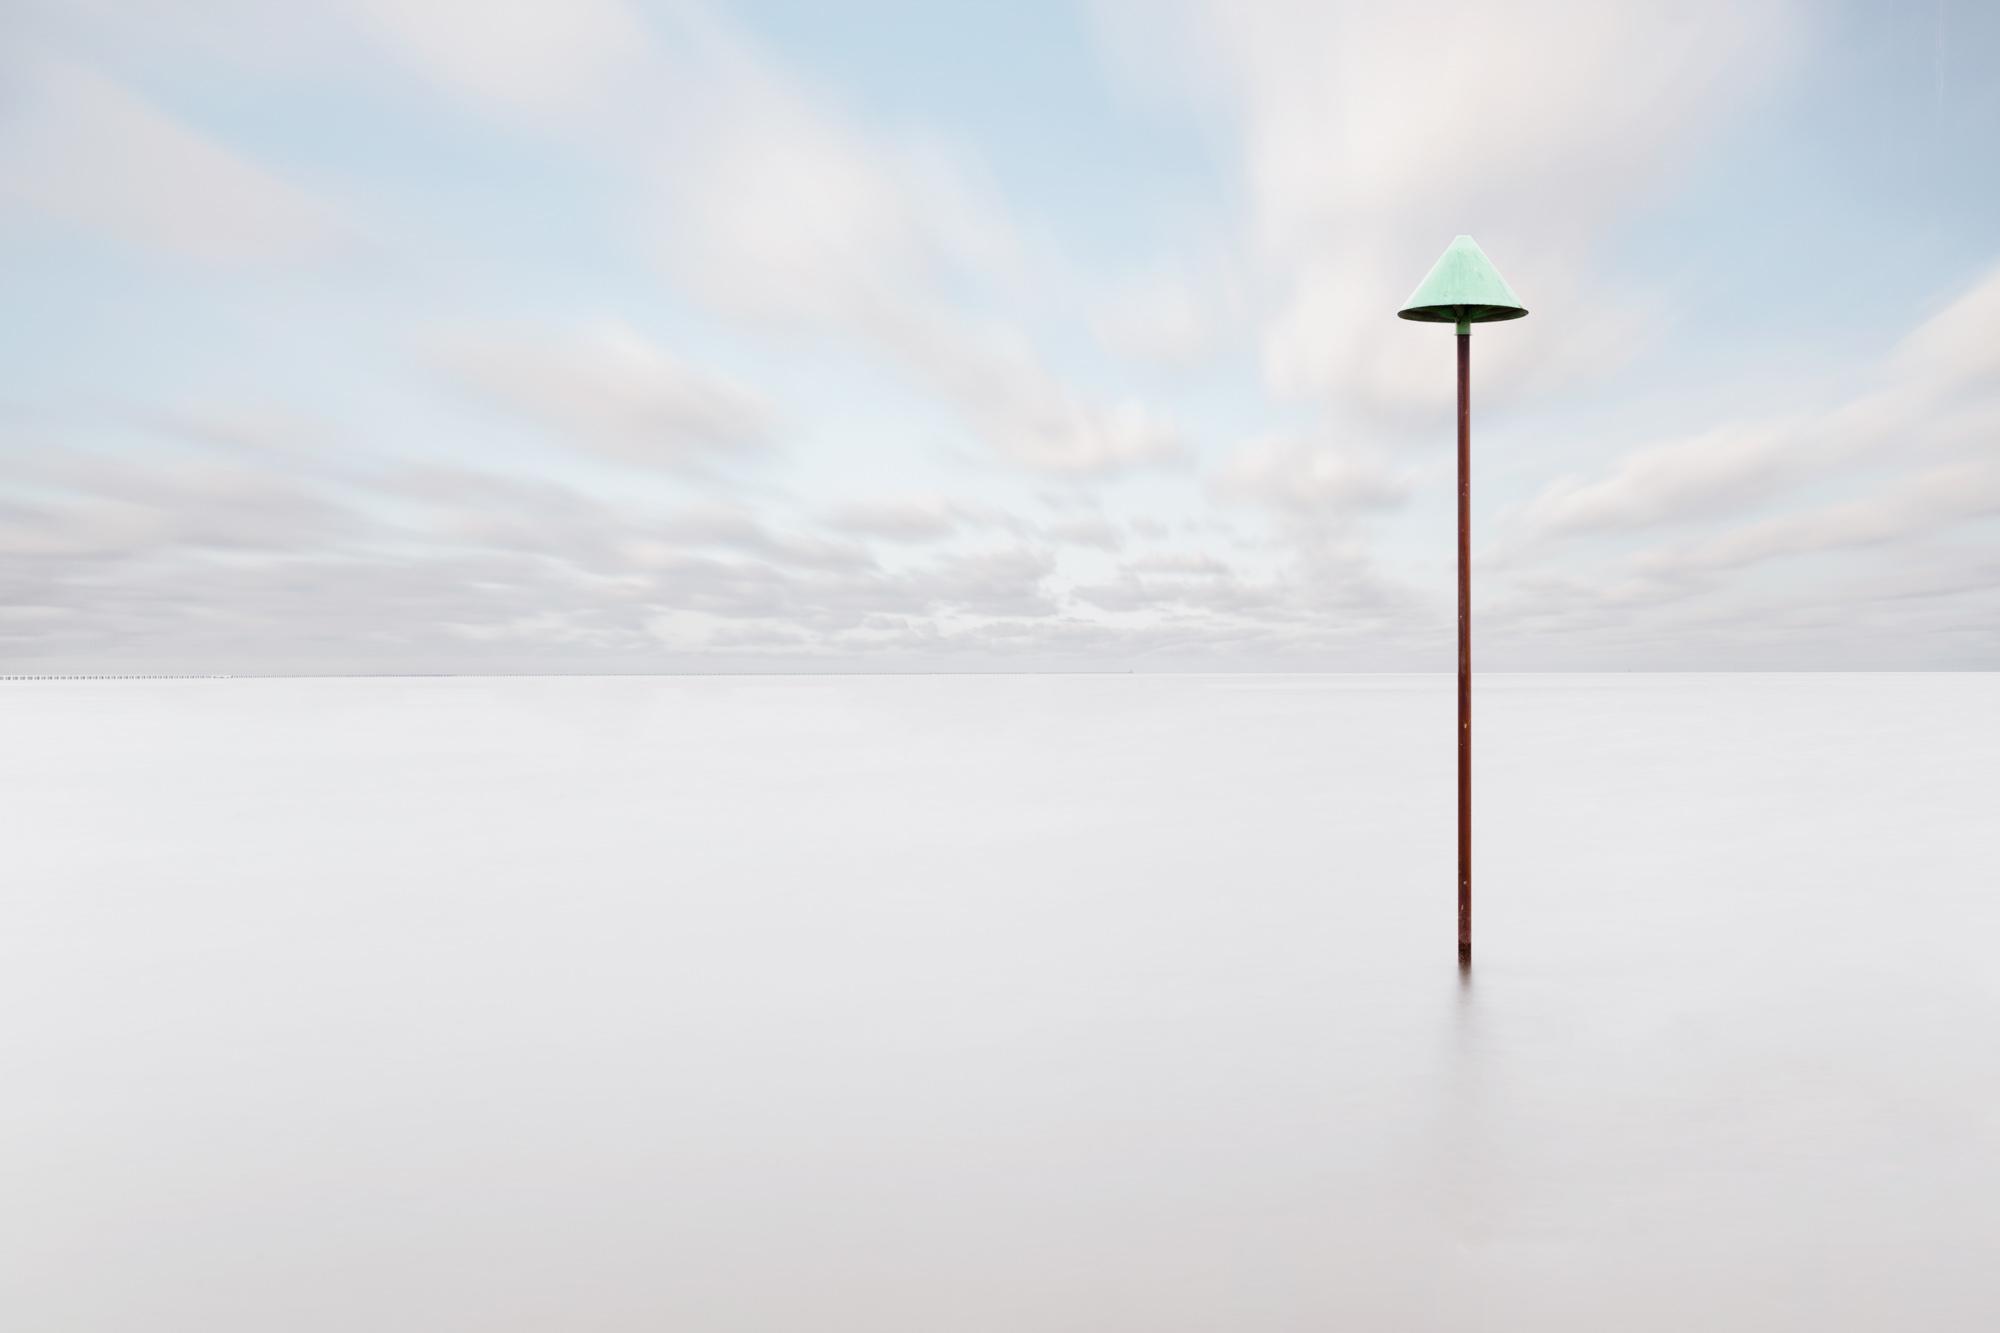 antonyz long exposure landscape minimal photograph of post in the sea